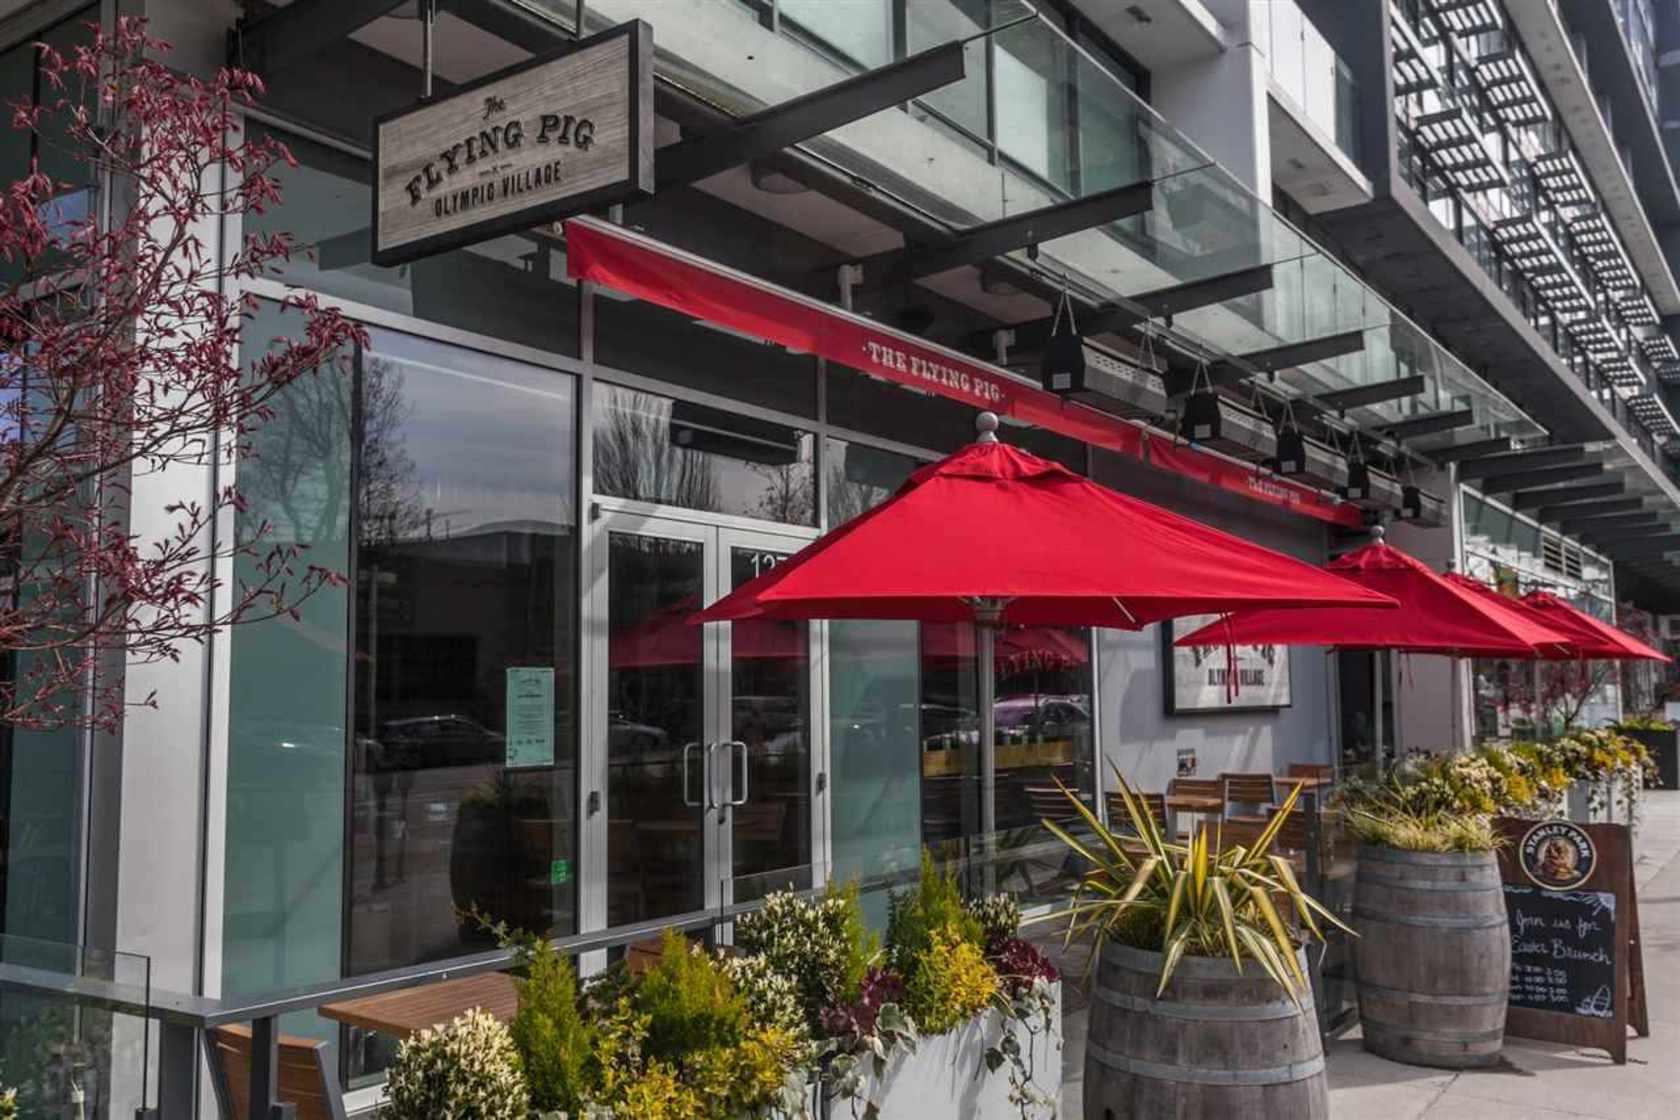 1783-manitoba-street-false-creek-vancouver-west-20 at 1601 - 1783 Manitoba Street, Olympic Village (False Creek), Vancouver West